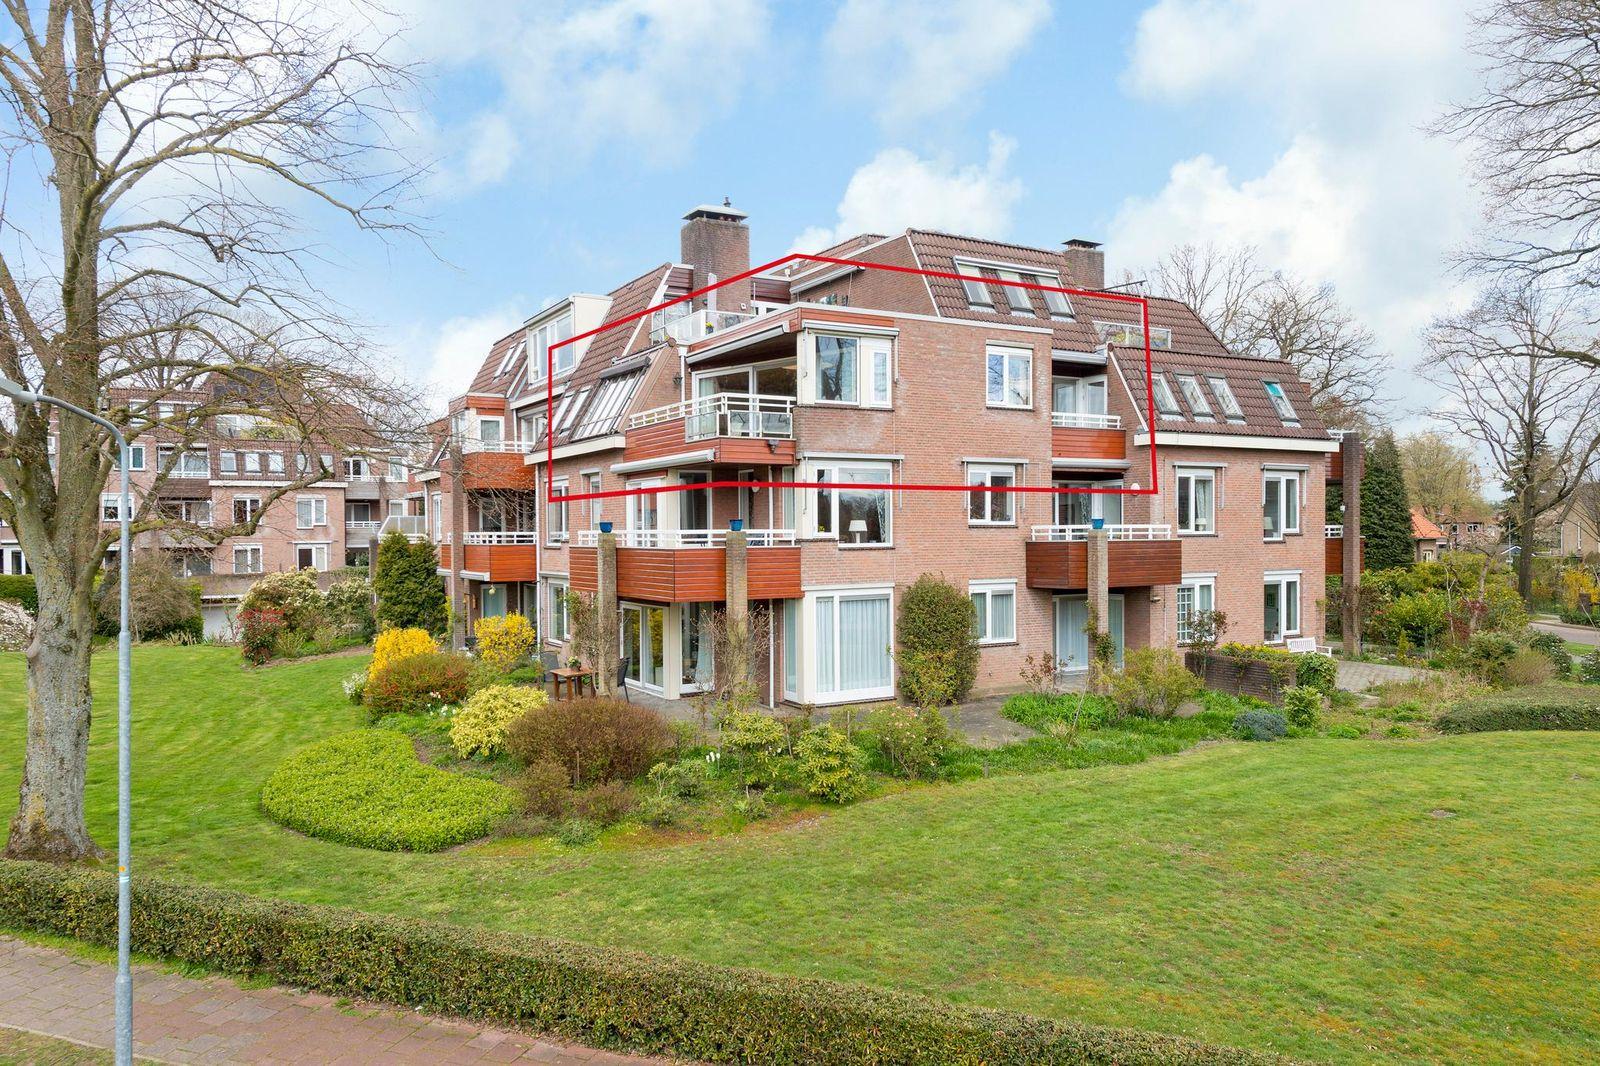 Oranjeweg 22, Oosterbeek